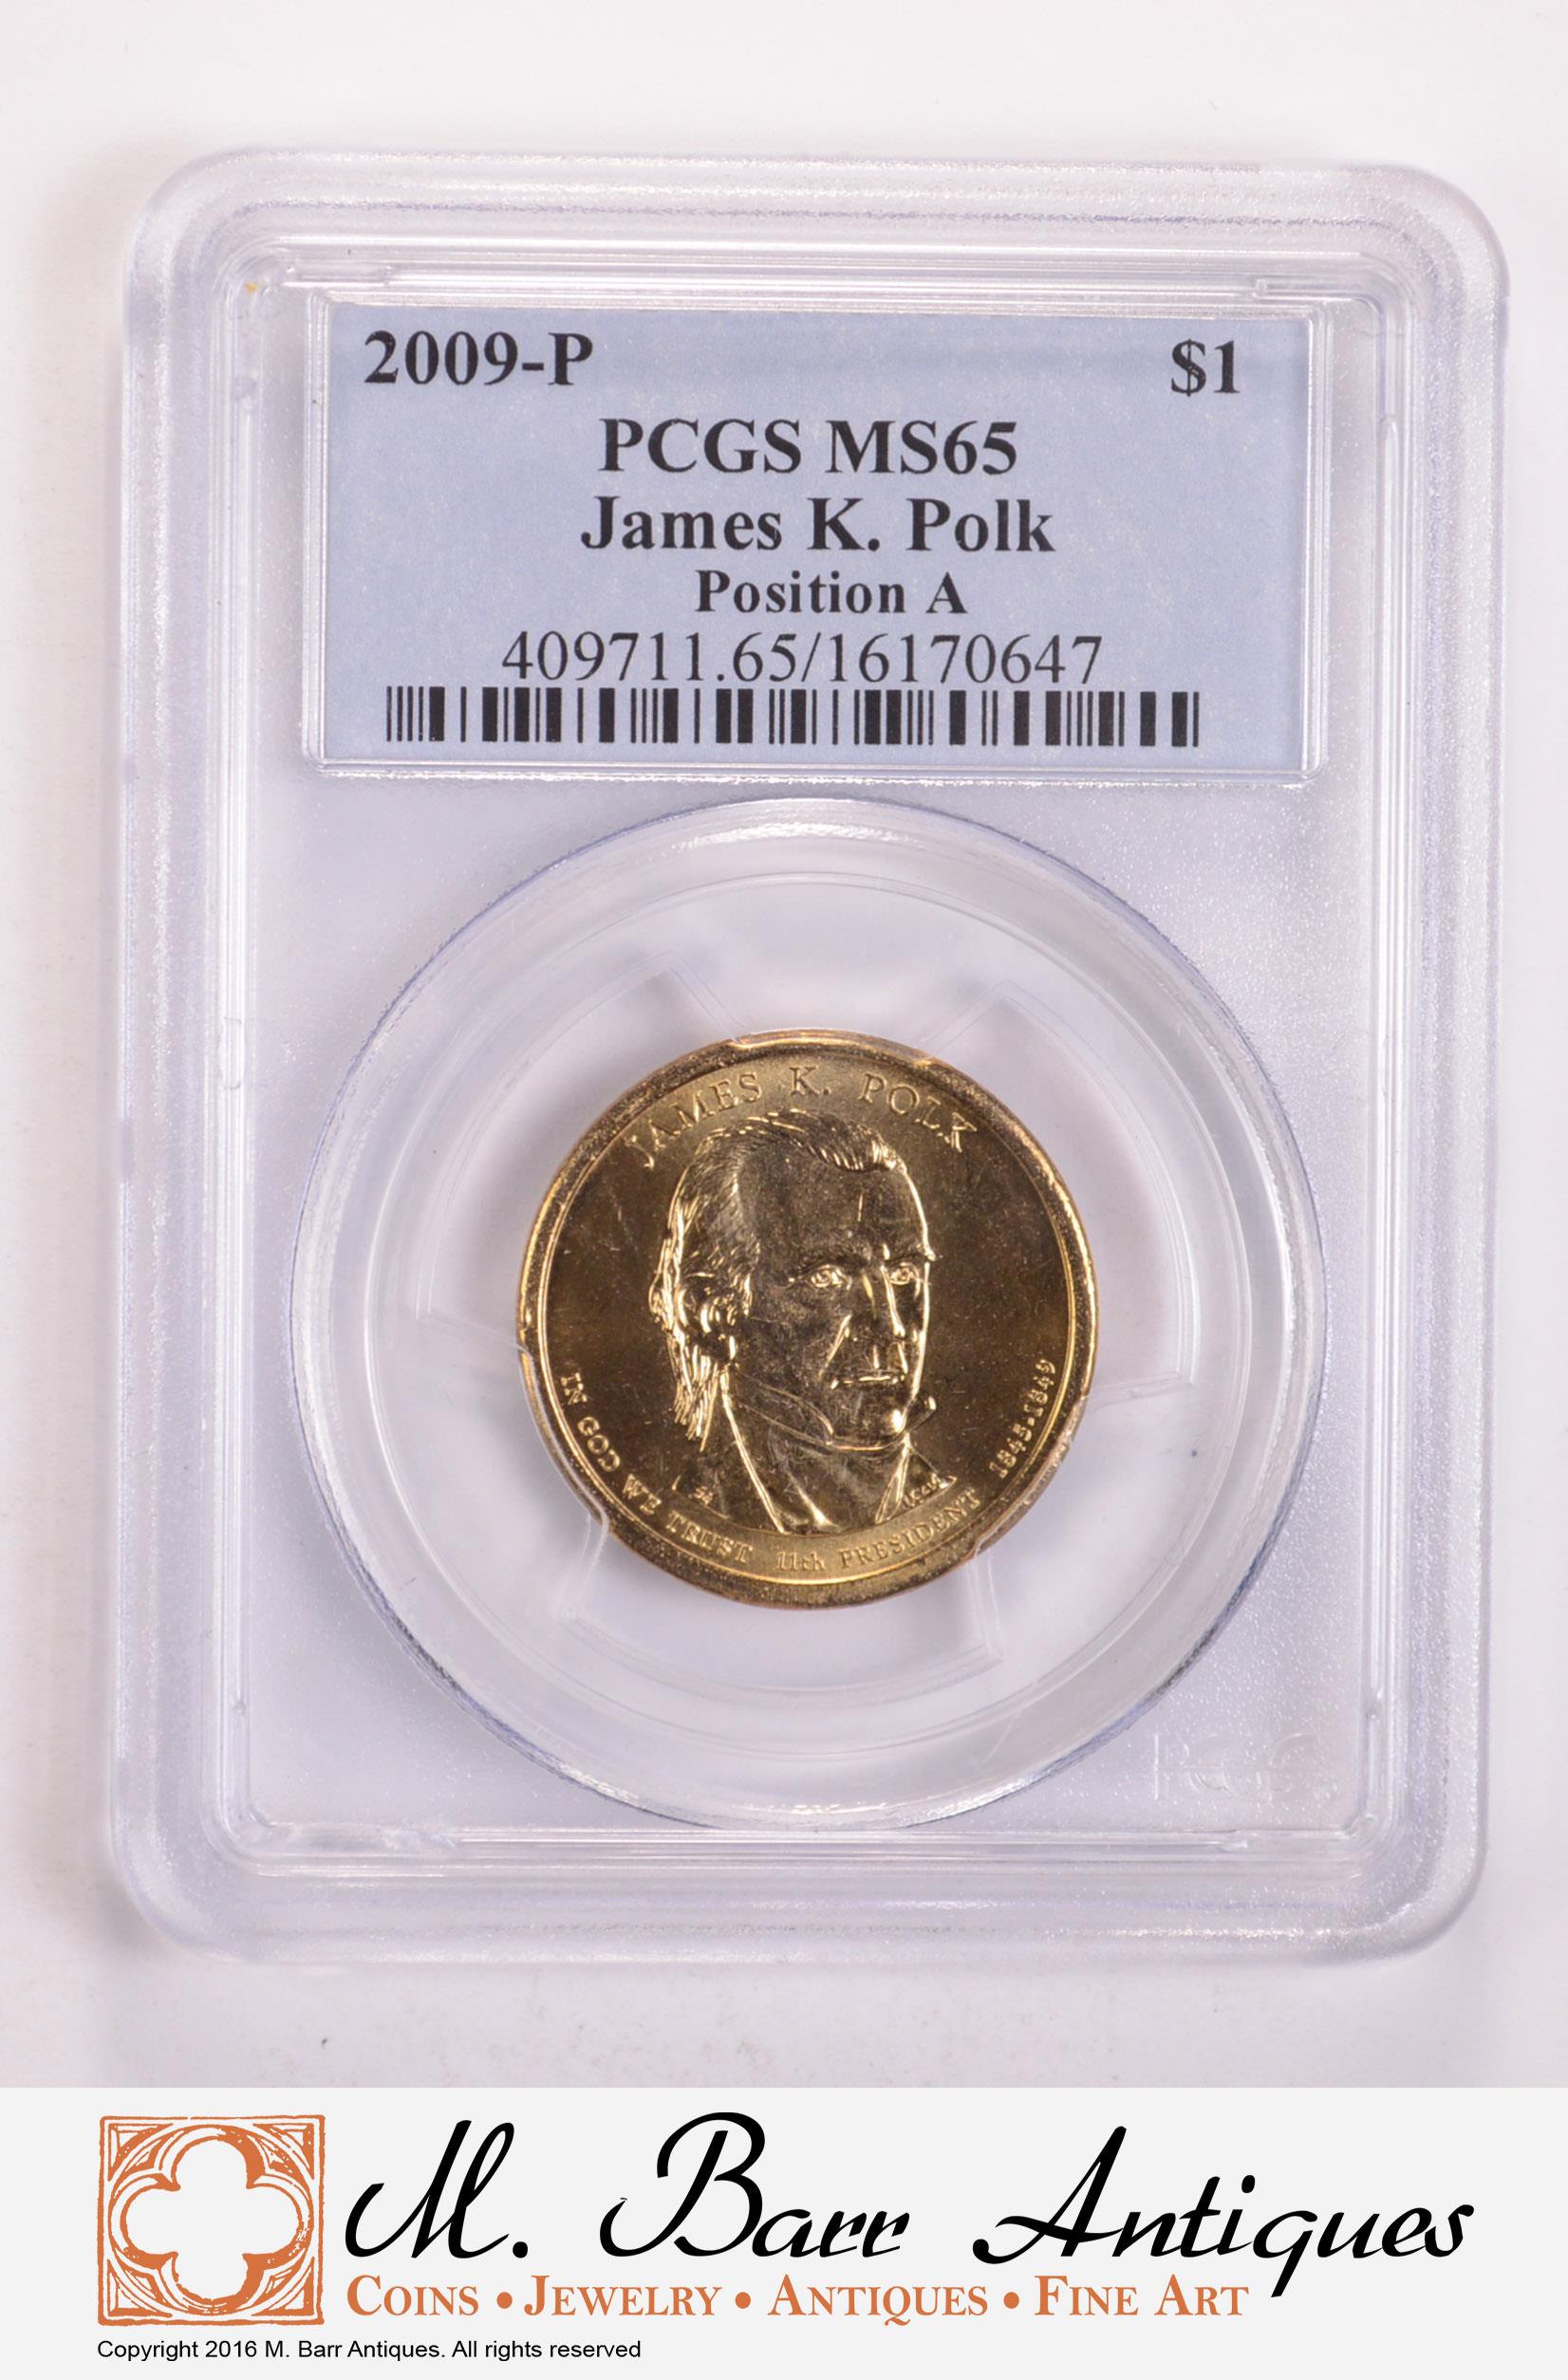 2009-P PCGS MS65 JAMES K POLK POSITION A